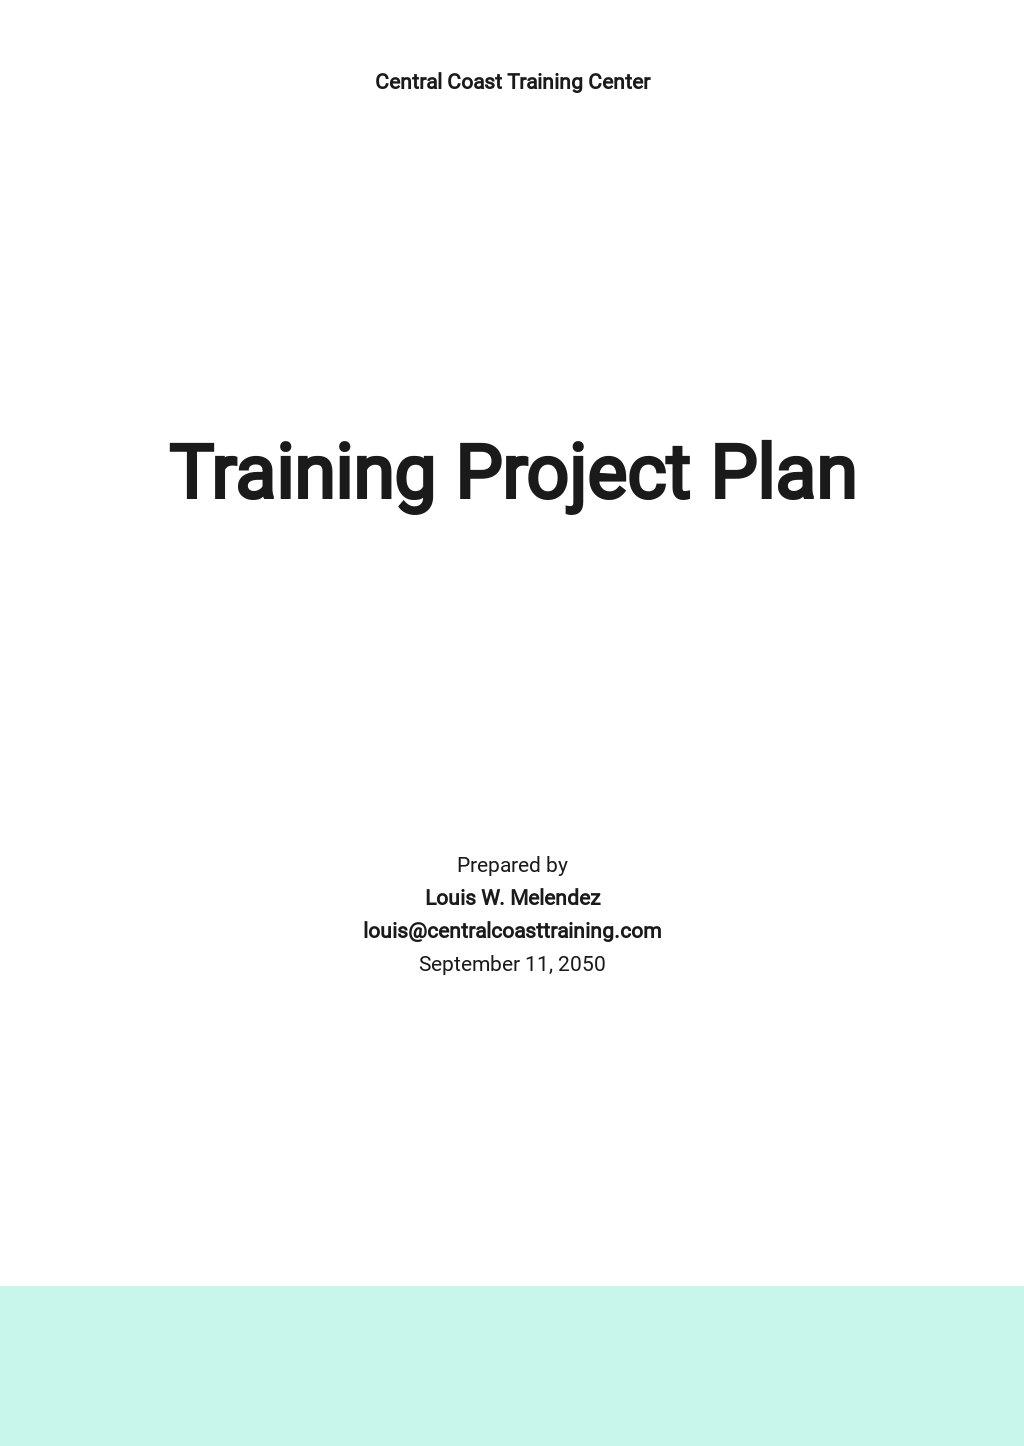 Sample Training Project Plan Template.jpe